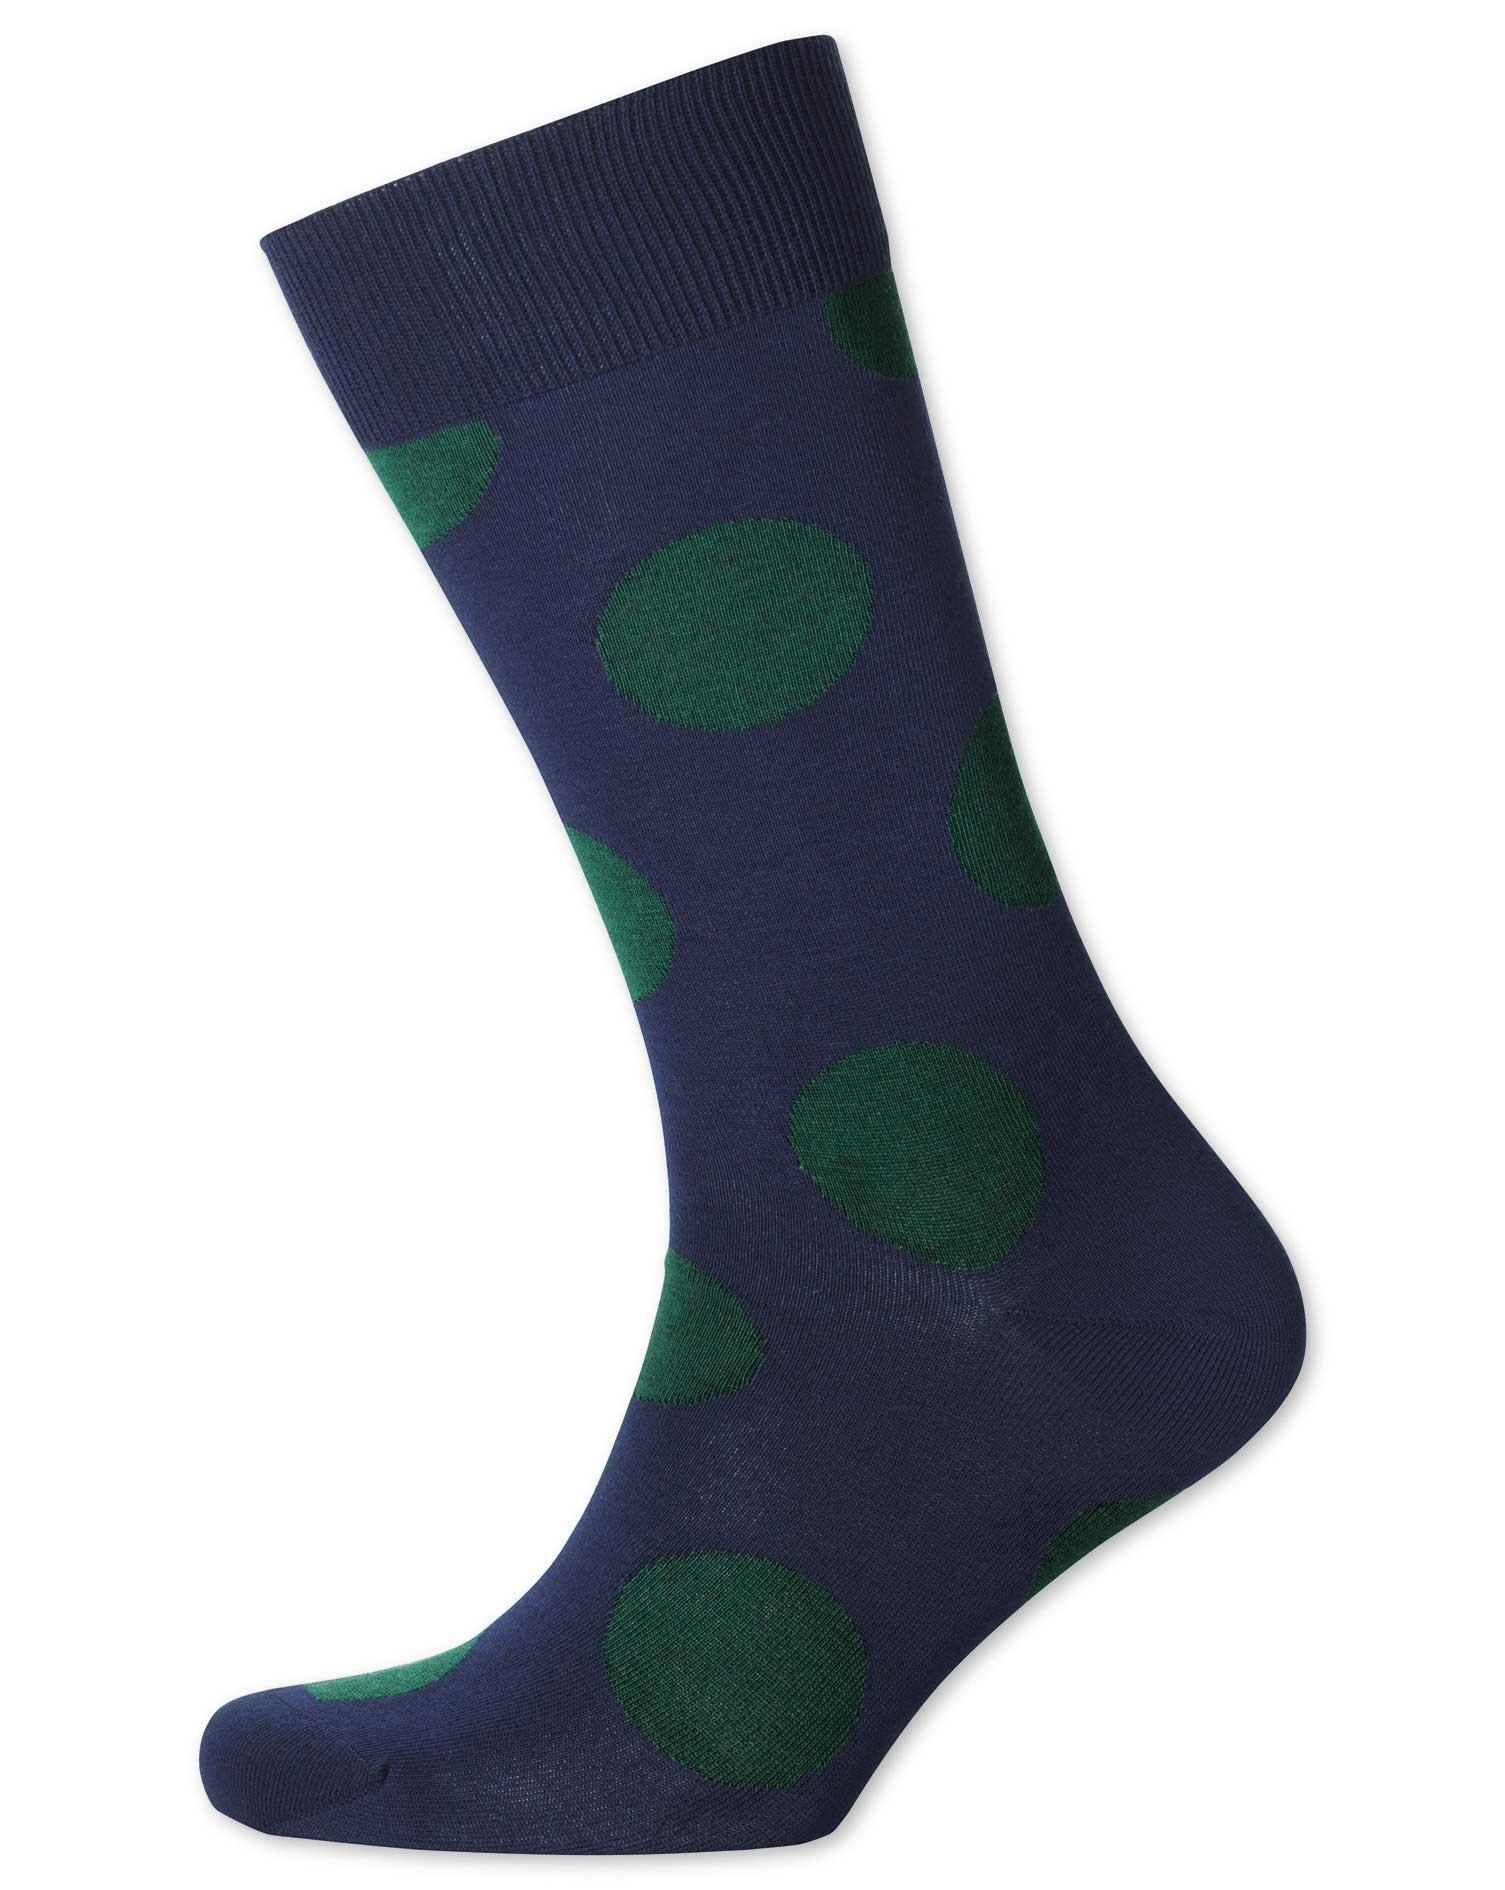 Navy and Green Large Spot Socks Size Medium by Charles Tyrwhitt